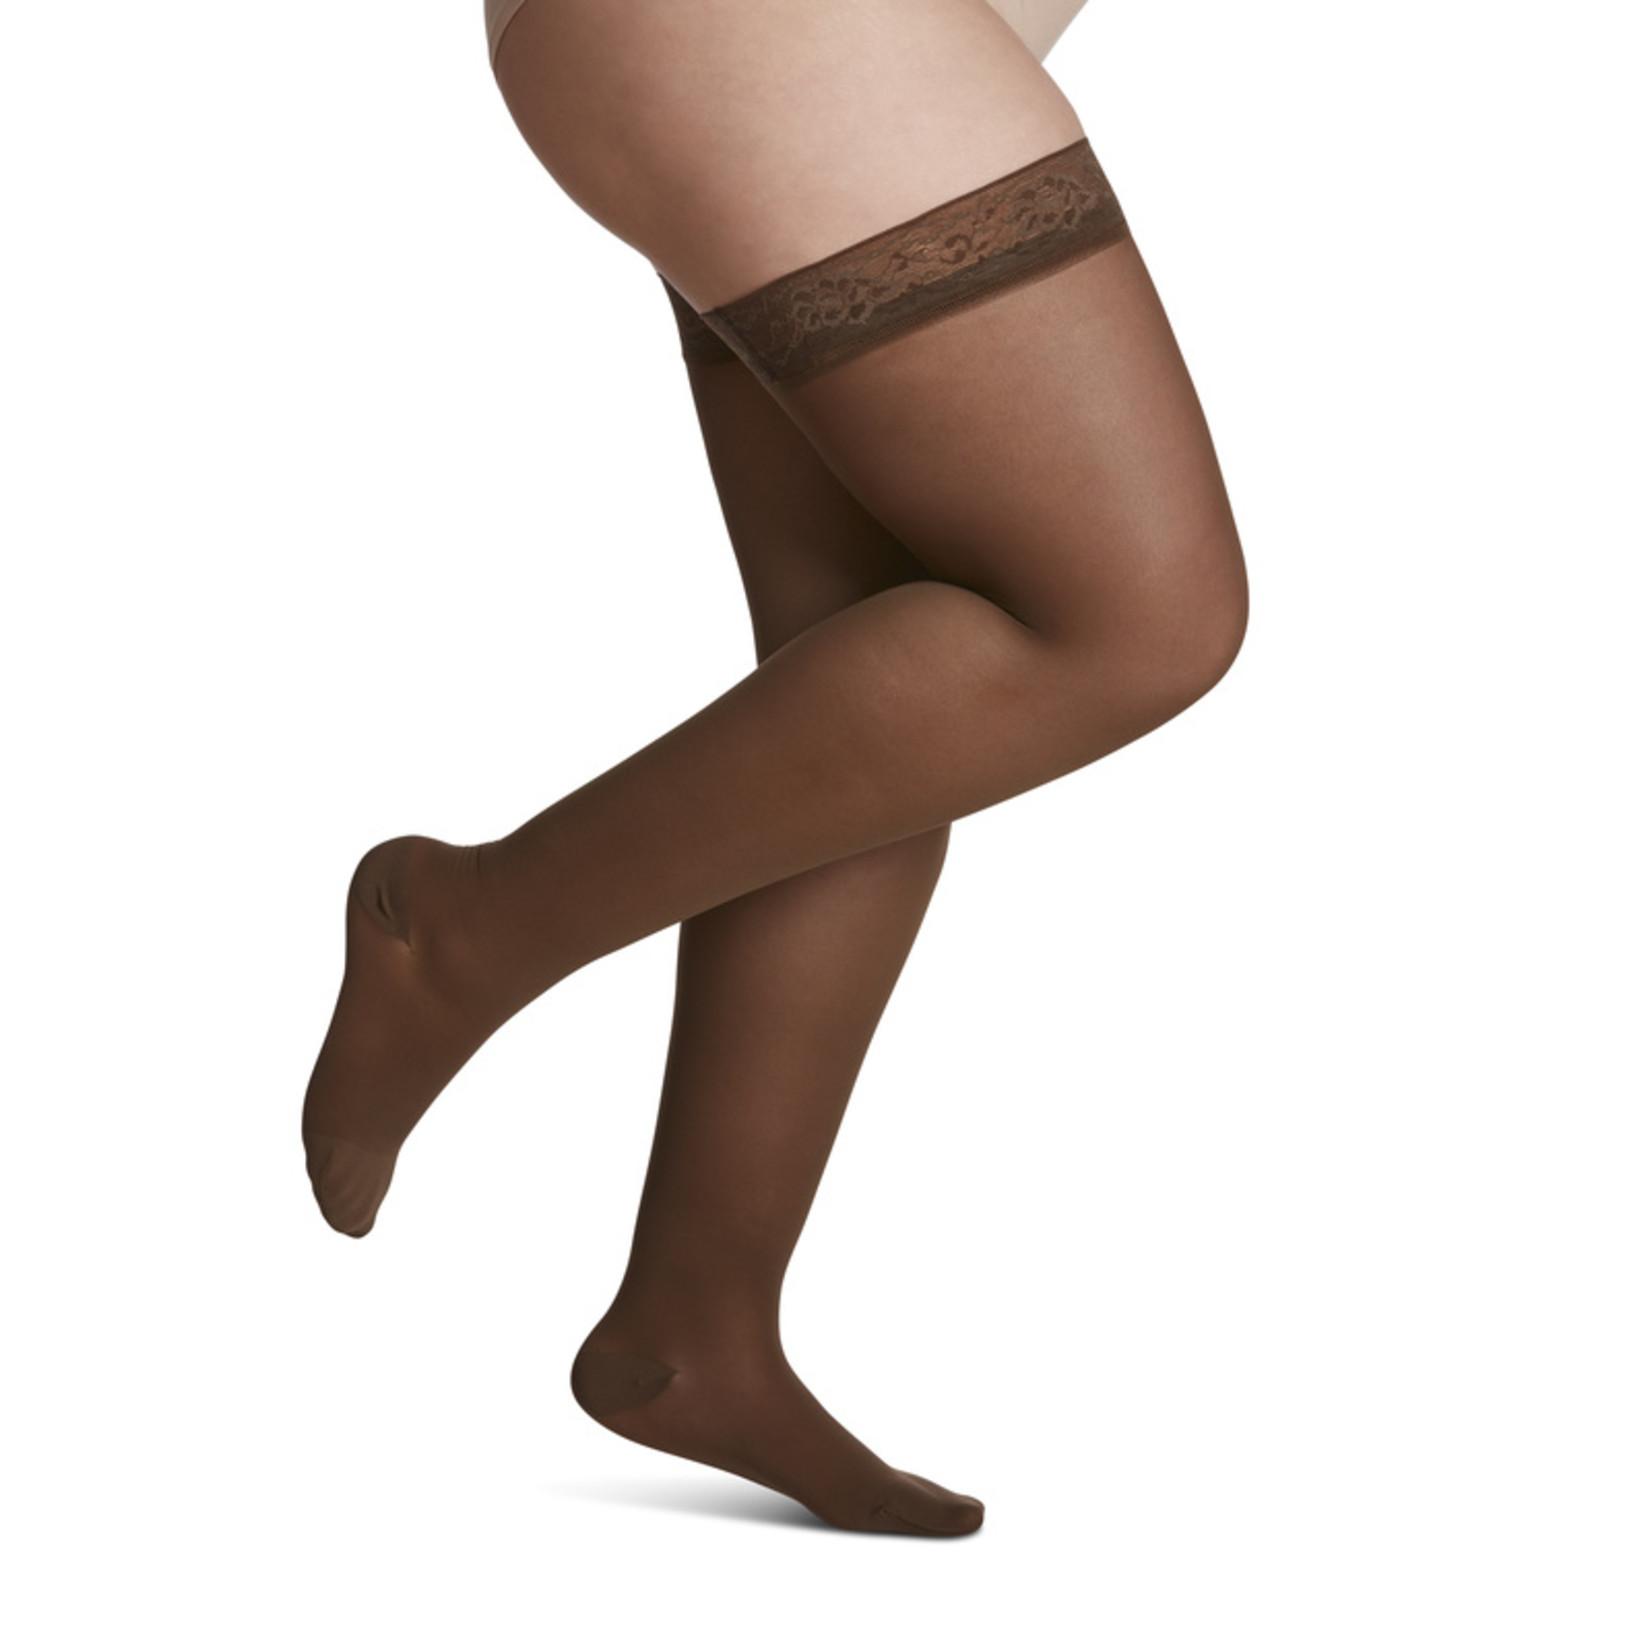 SIGVARIS Women's Style Sheer Thigh-High 15-20mmHg